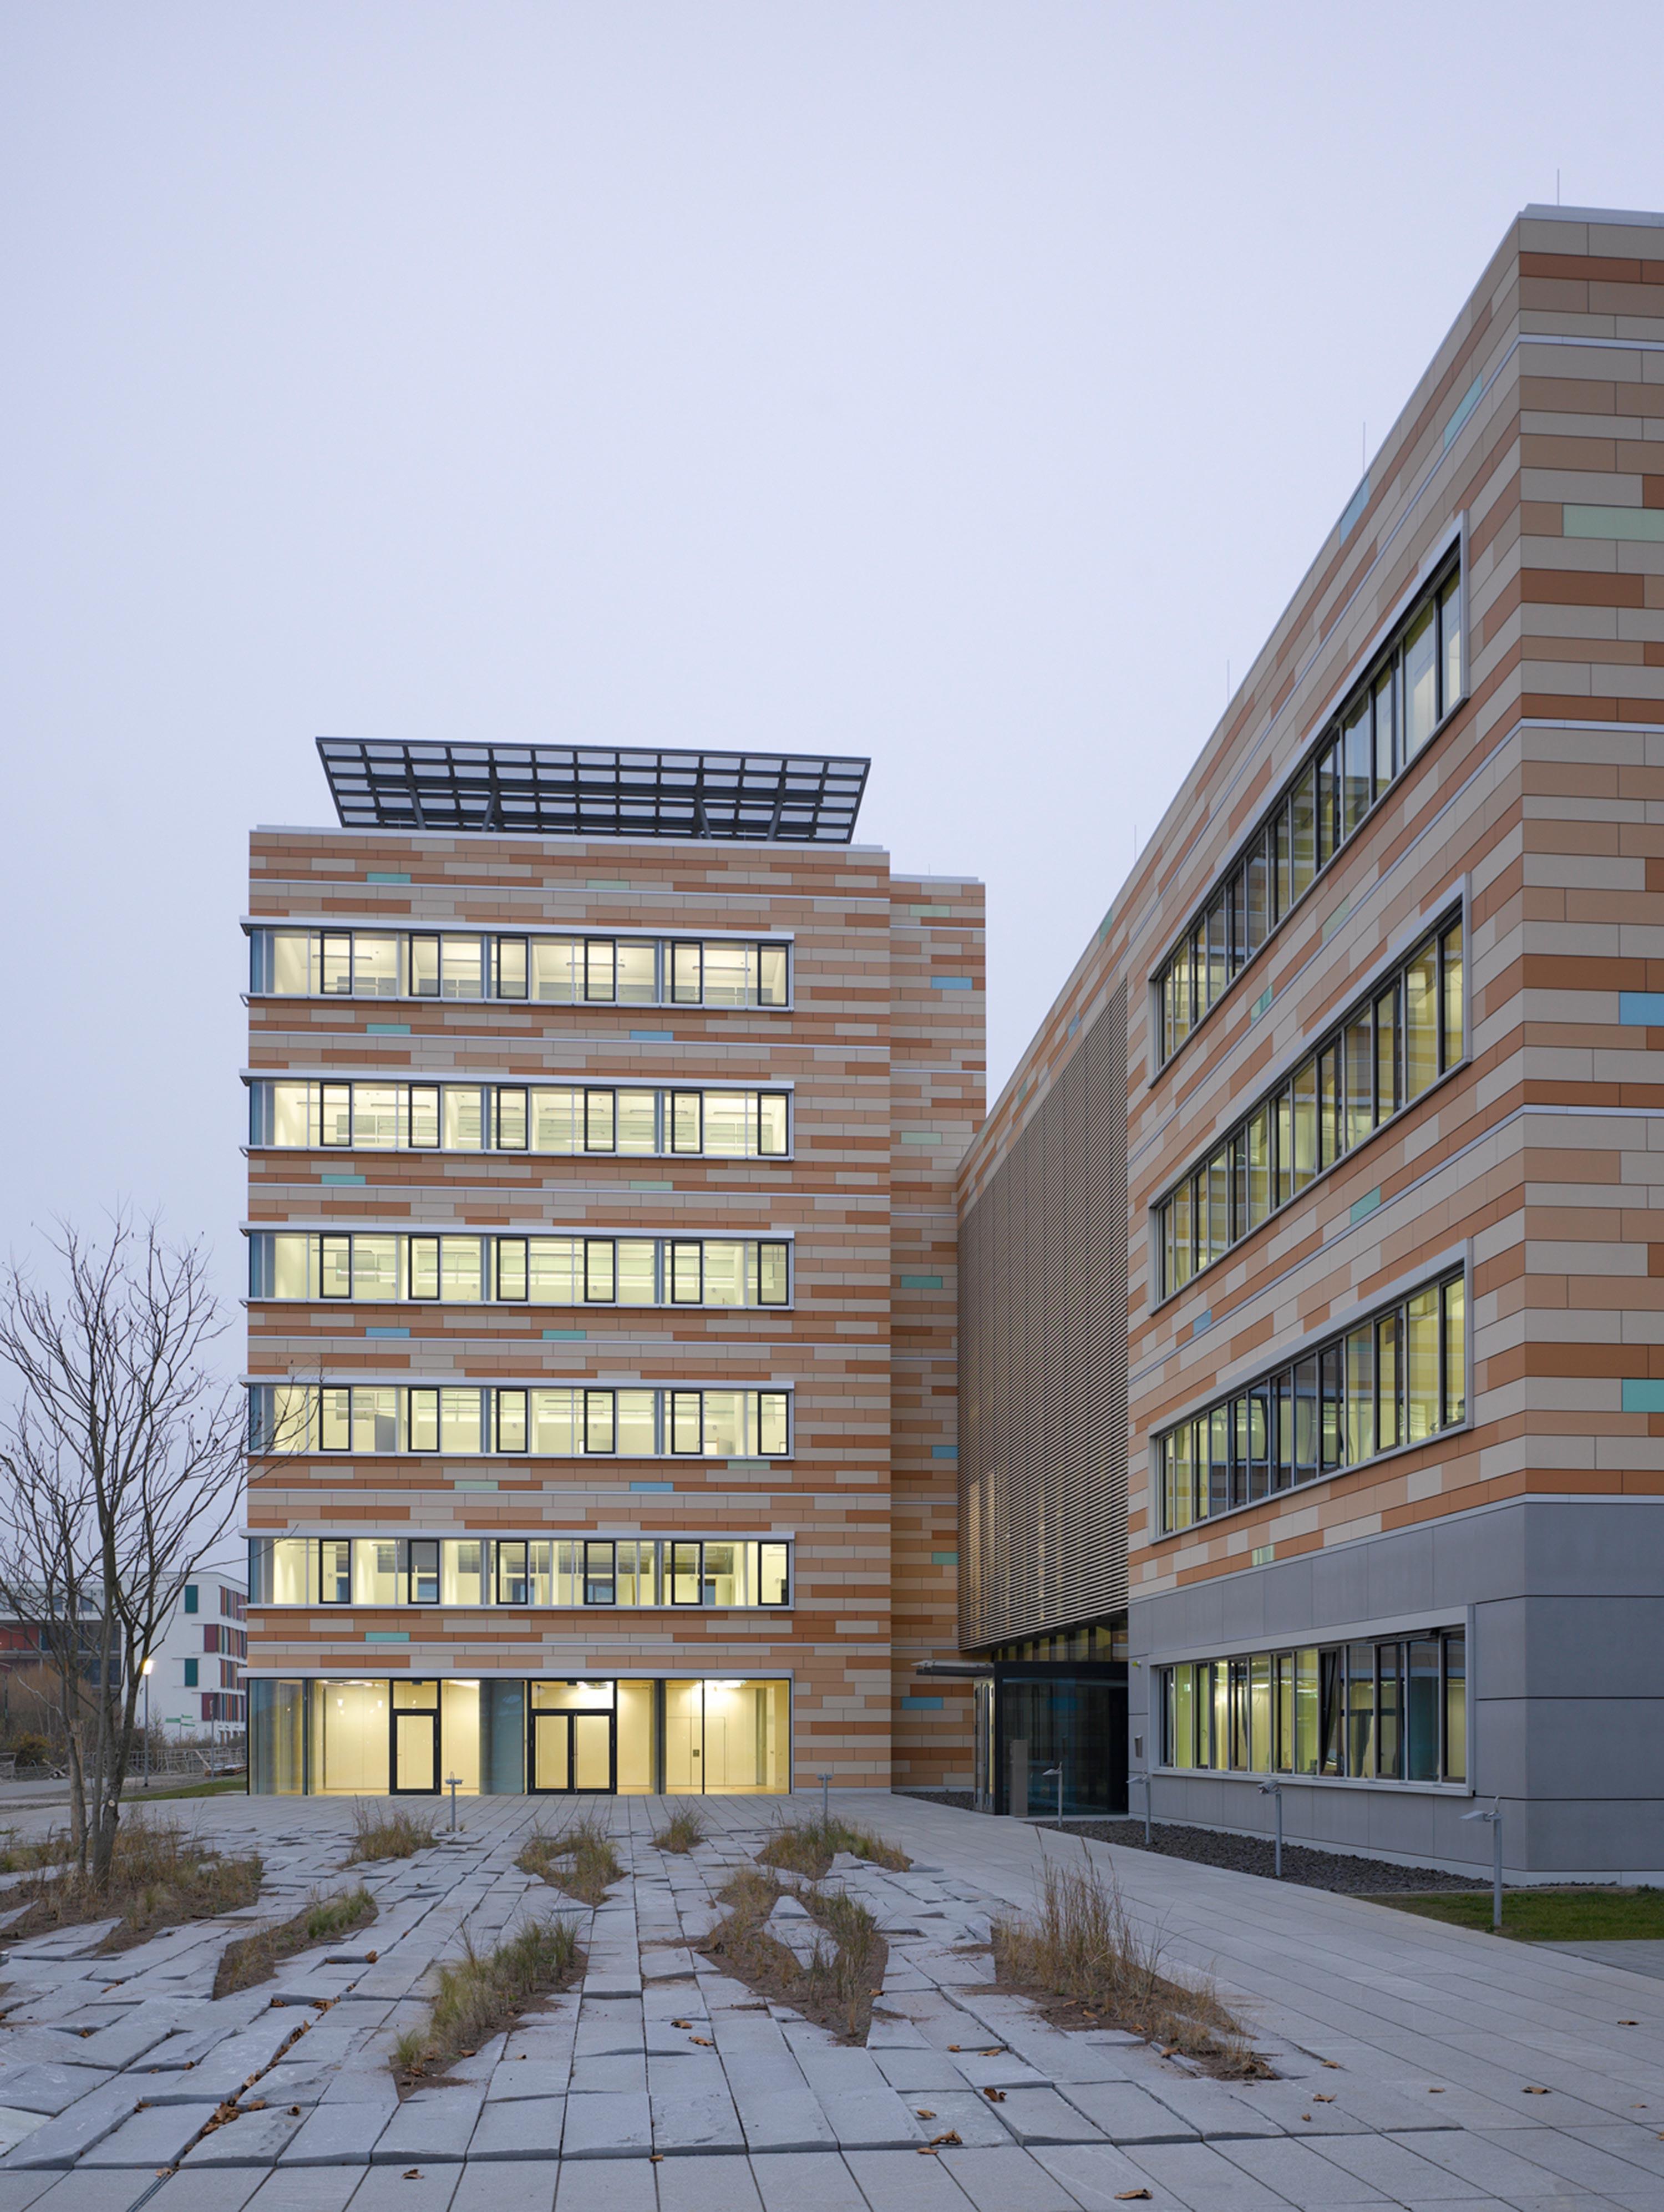 Max-Planck-Institut für Chemie (4)